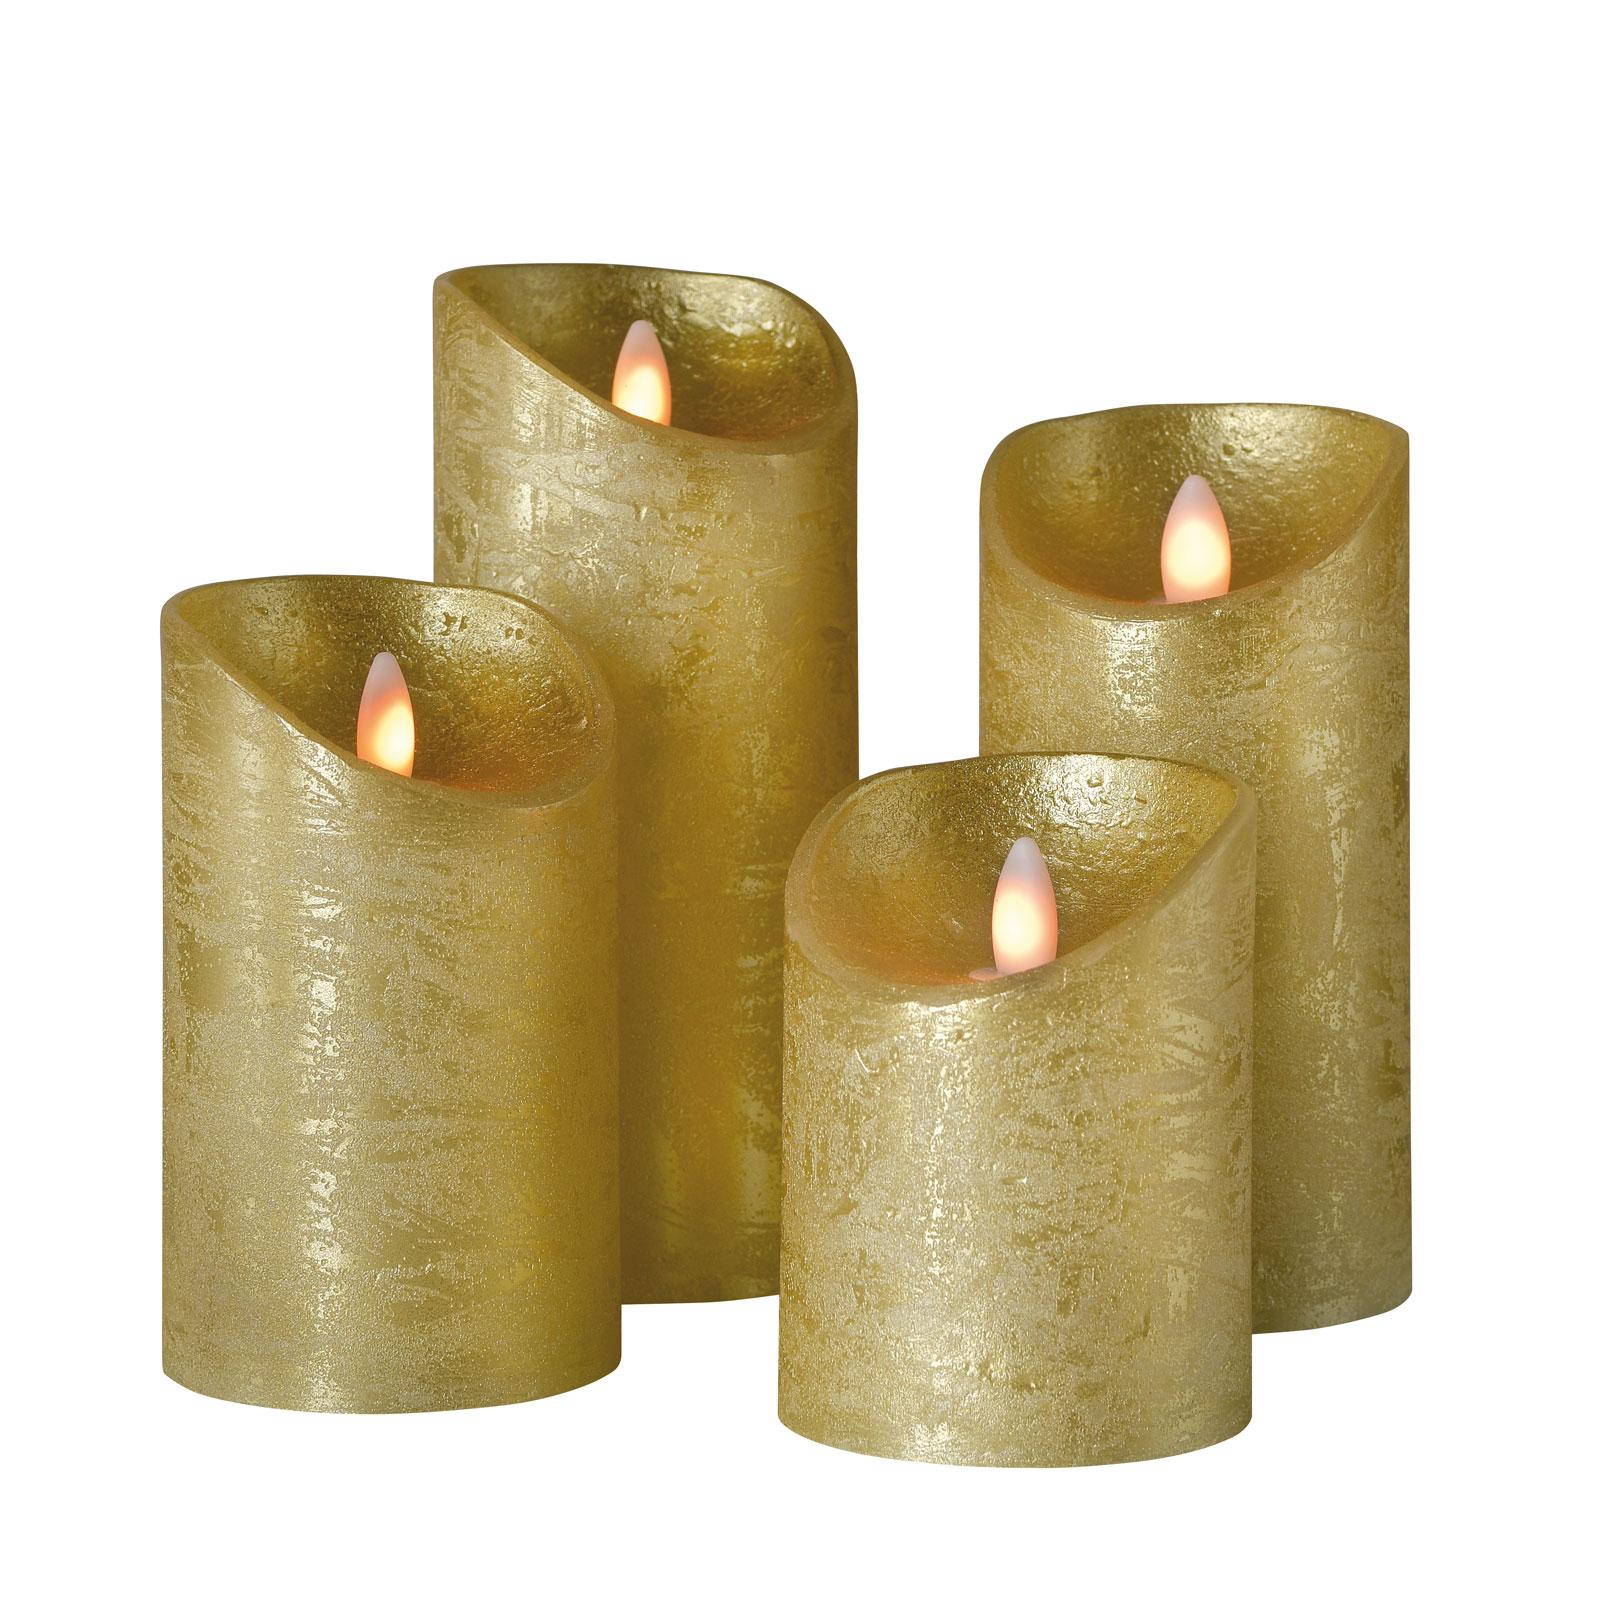 LED-kynttilä Shine, 4 kpl, Ø 7,5 cm, kulta